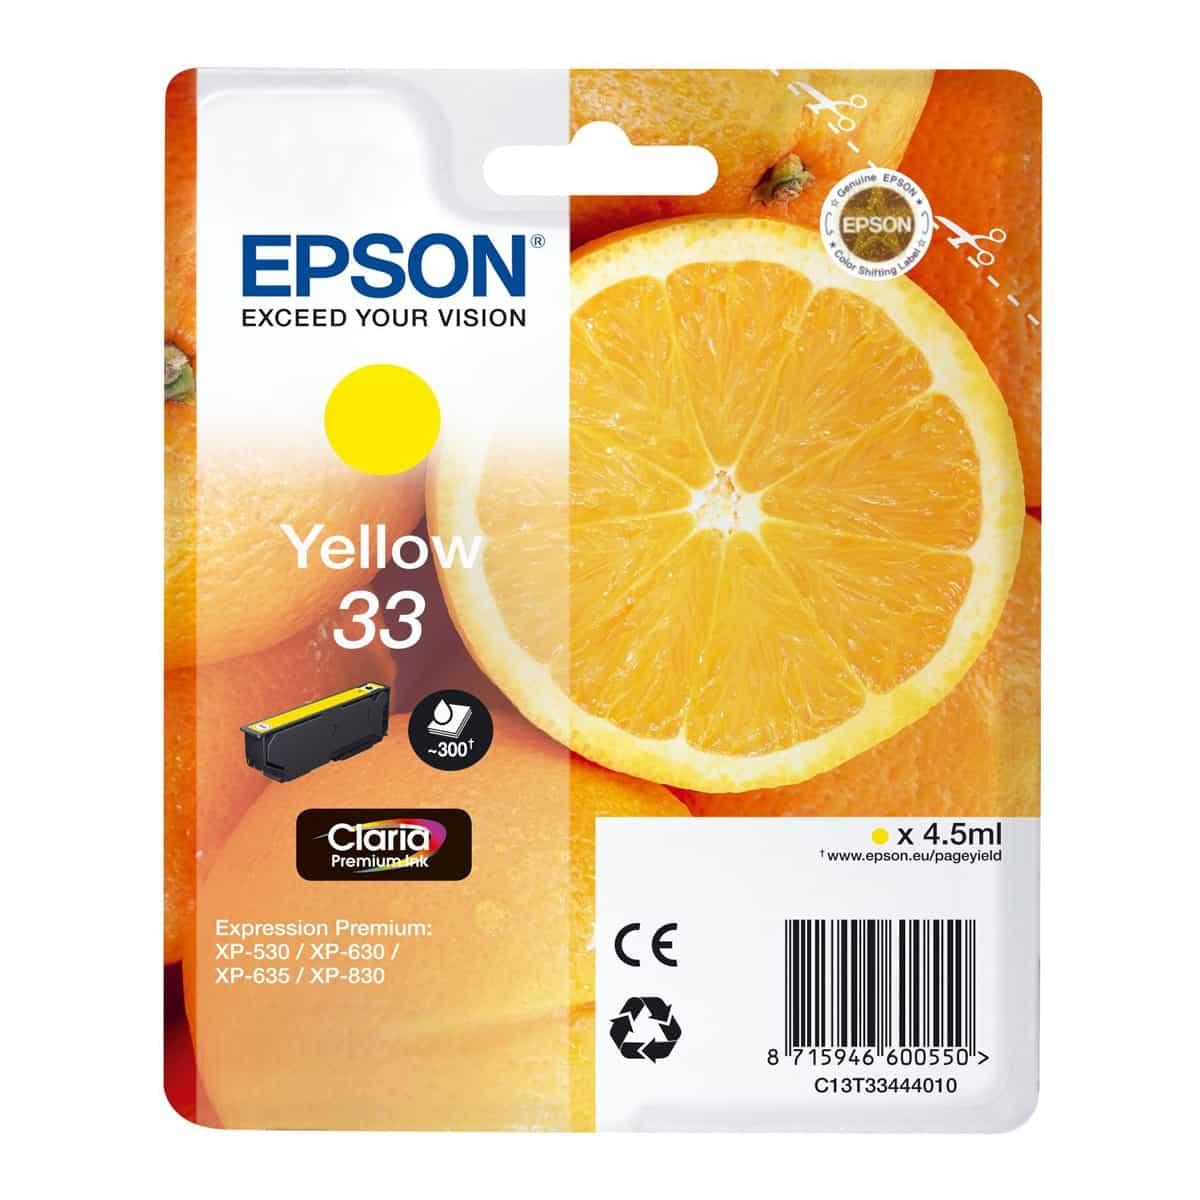 Cartucho original Epson Claria 33 Amarillo